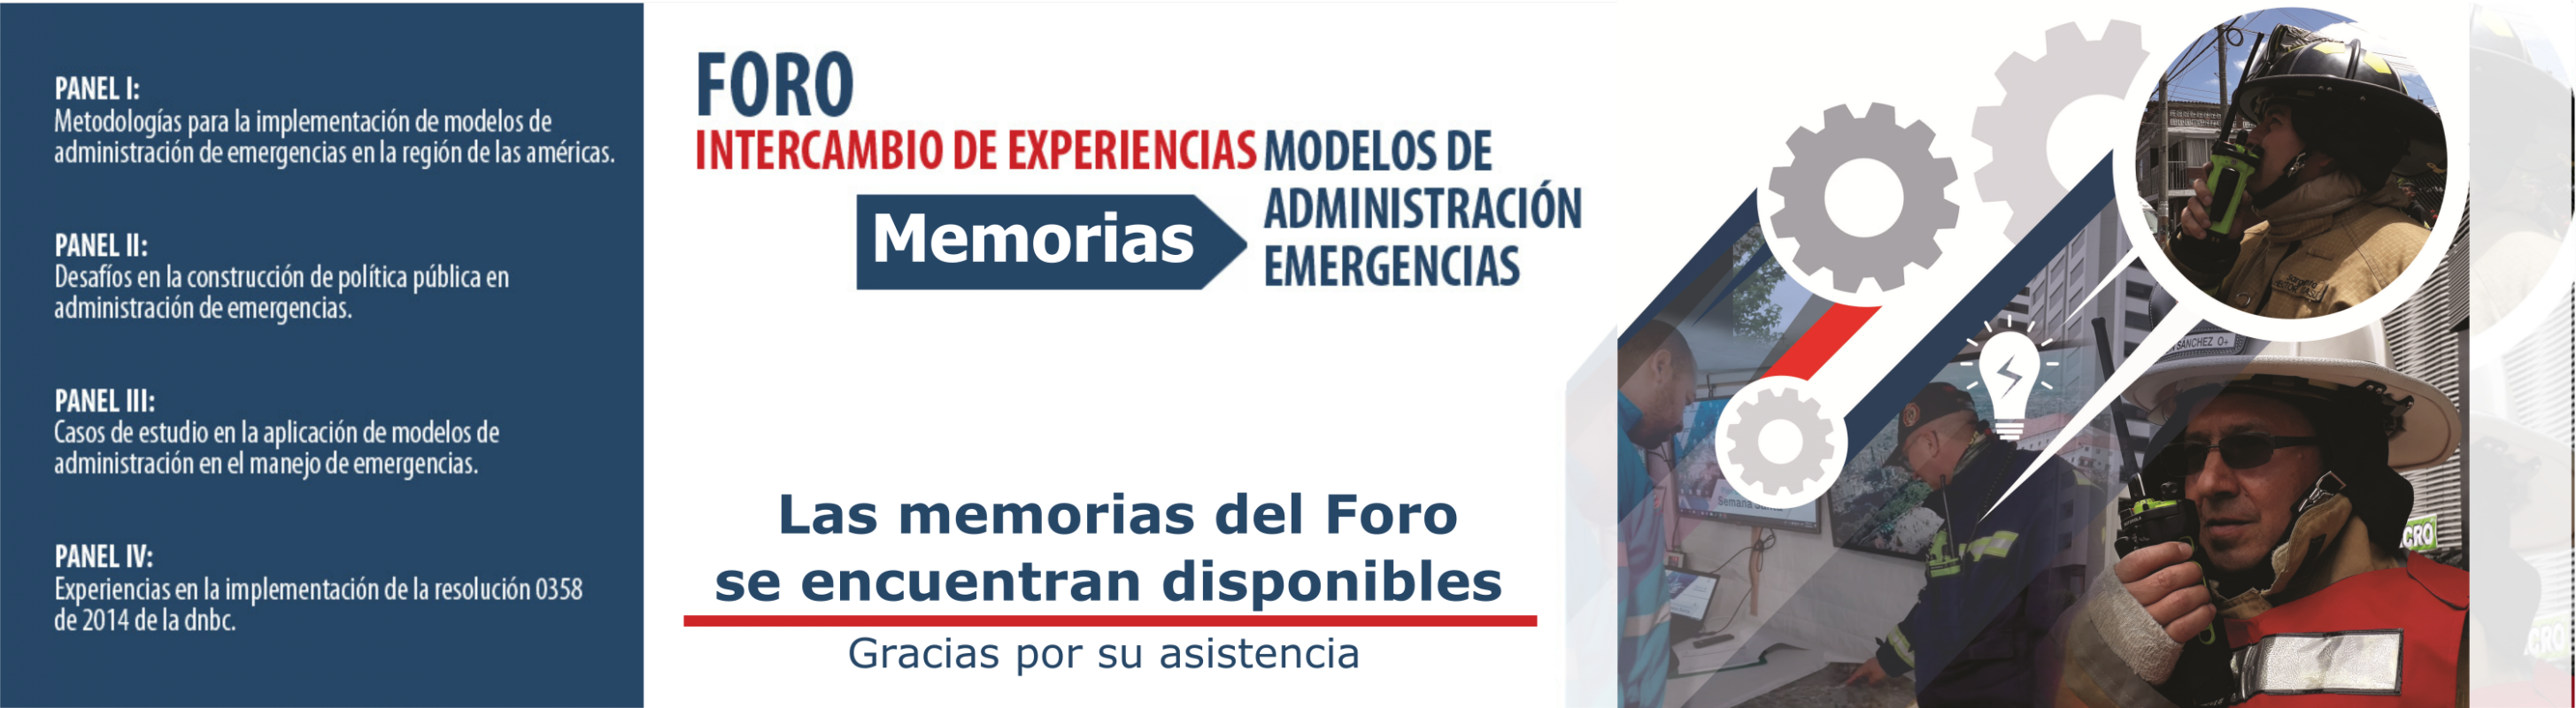 Memorias - Foro de Intercambio de Experiencias Modelos de Administración de Emergencias